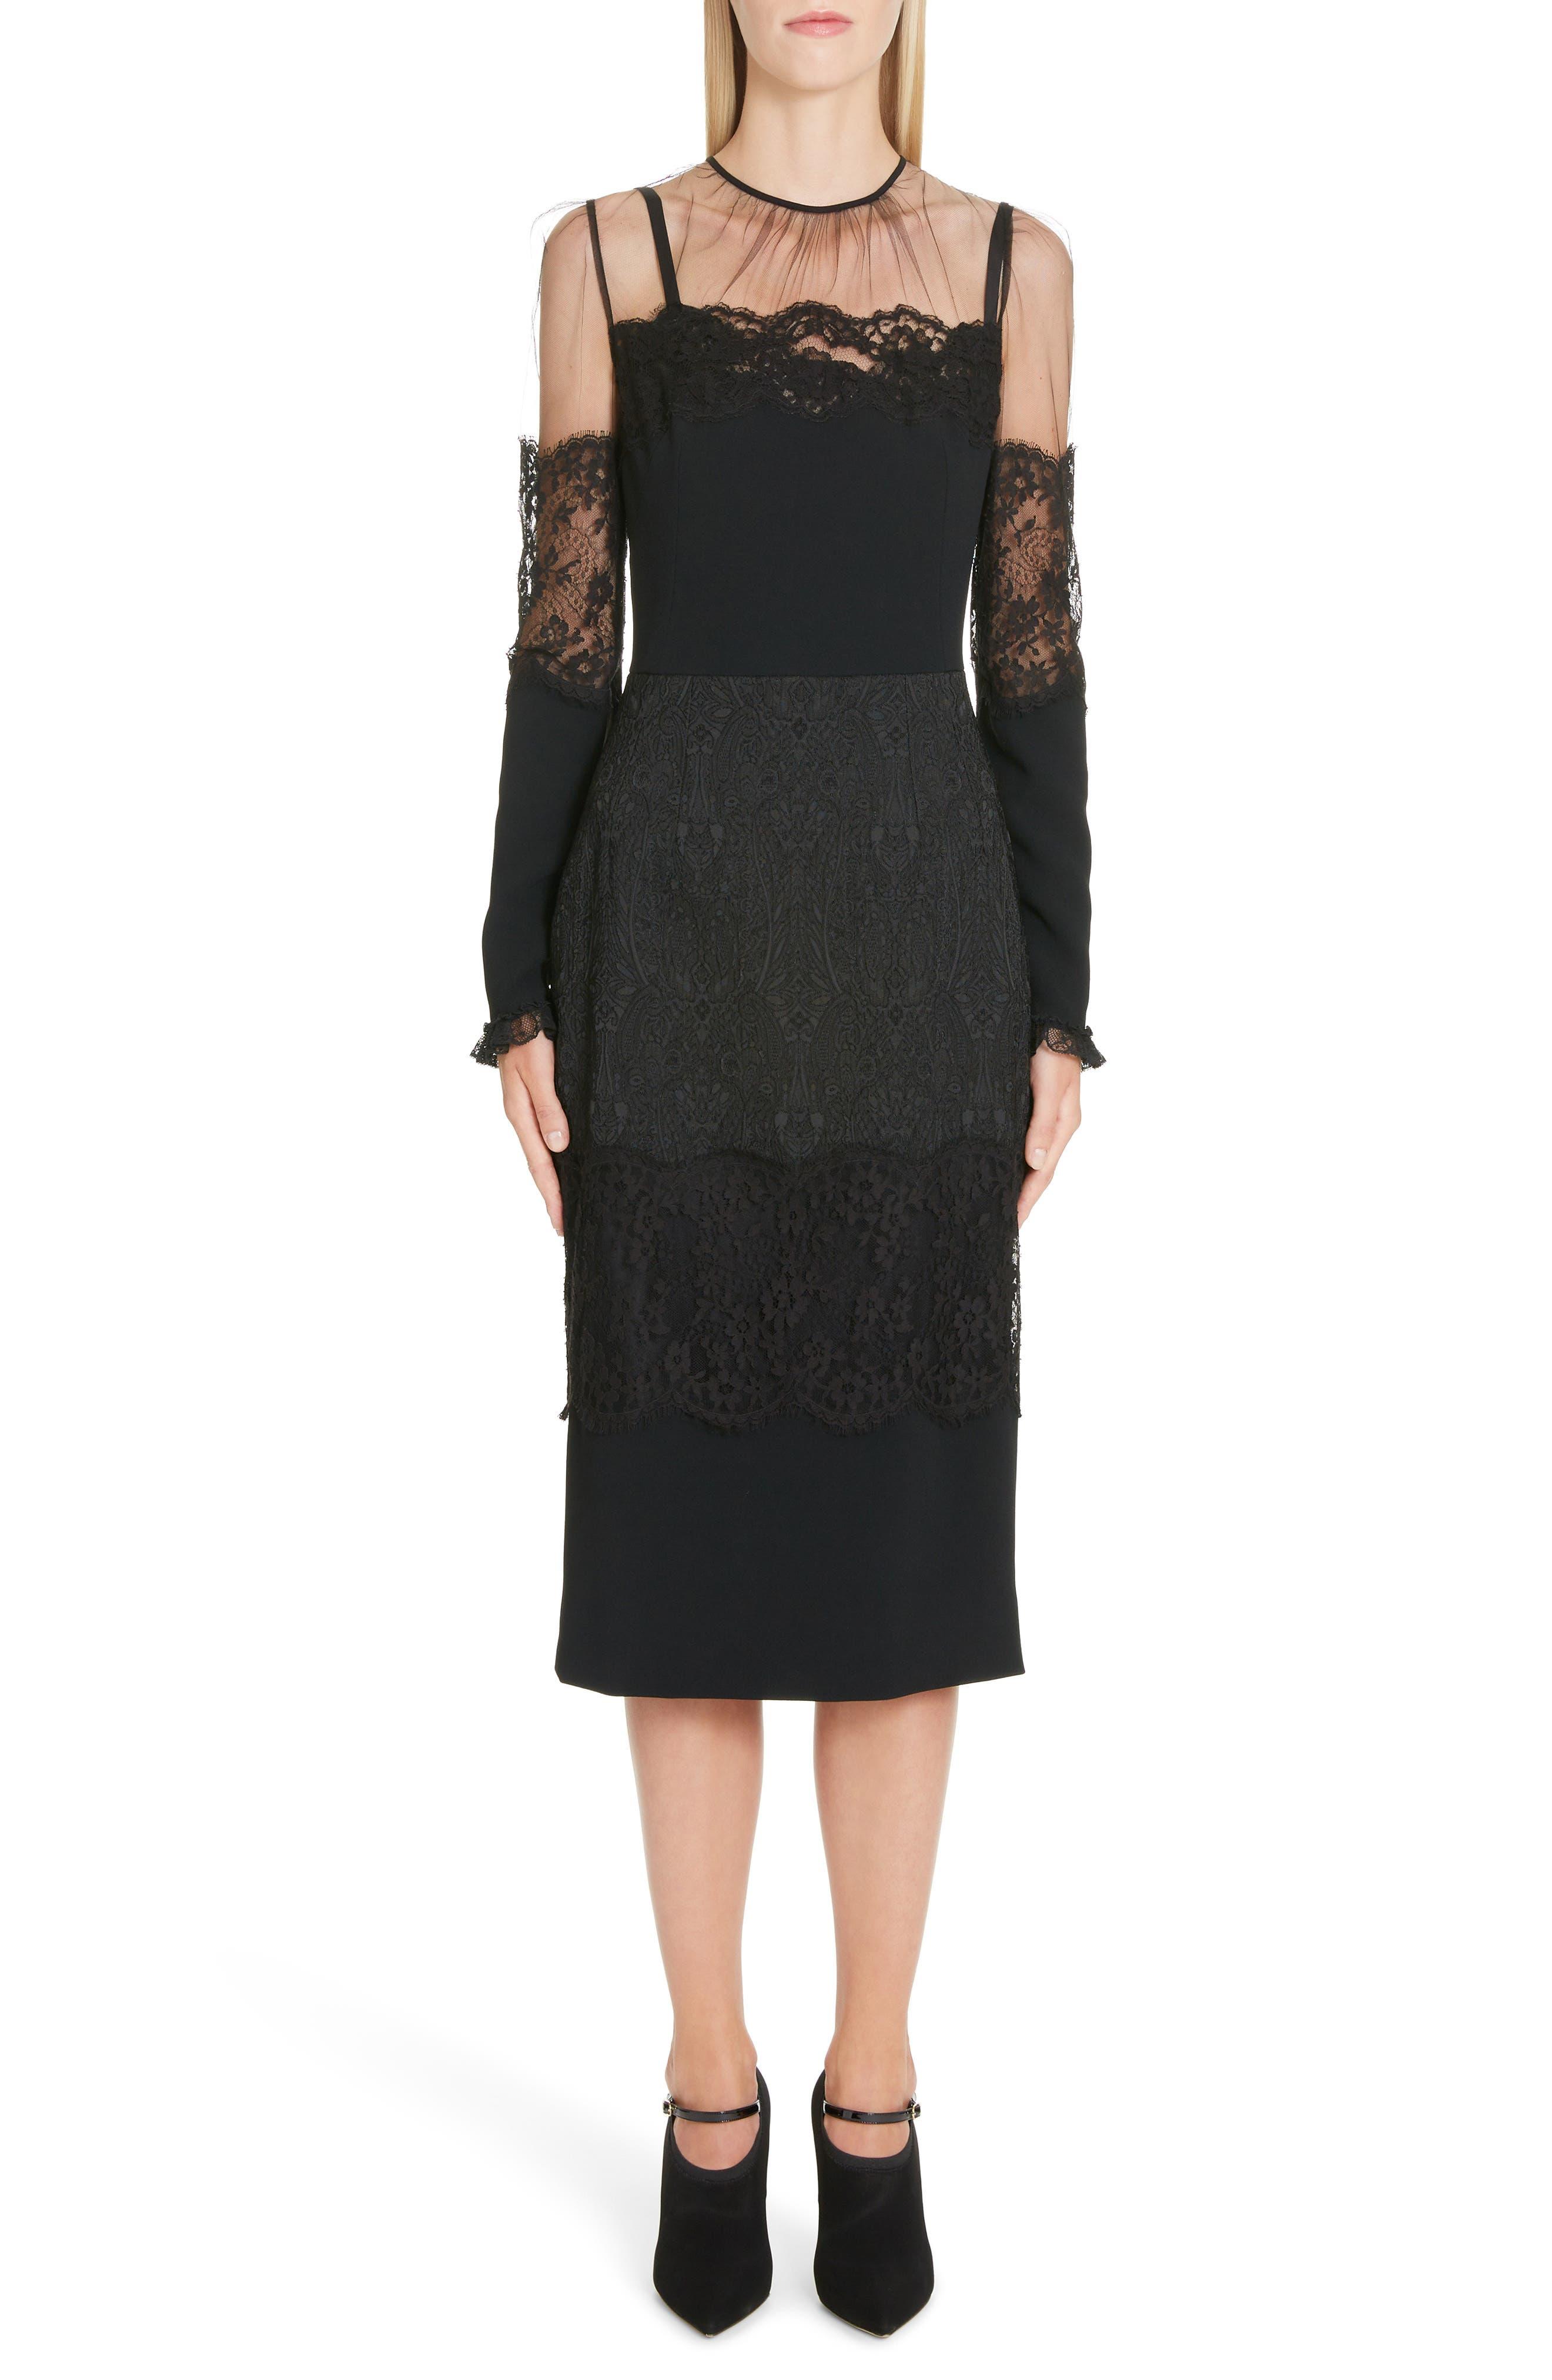 Dolce & gabbana Sheer Yoke Lace Sheath Dress, 50 IT - Black